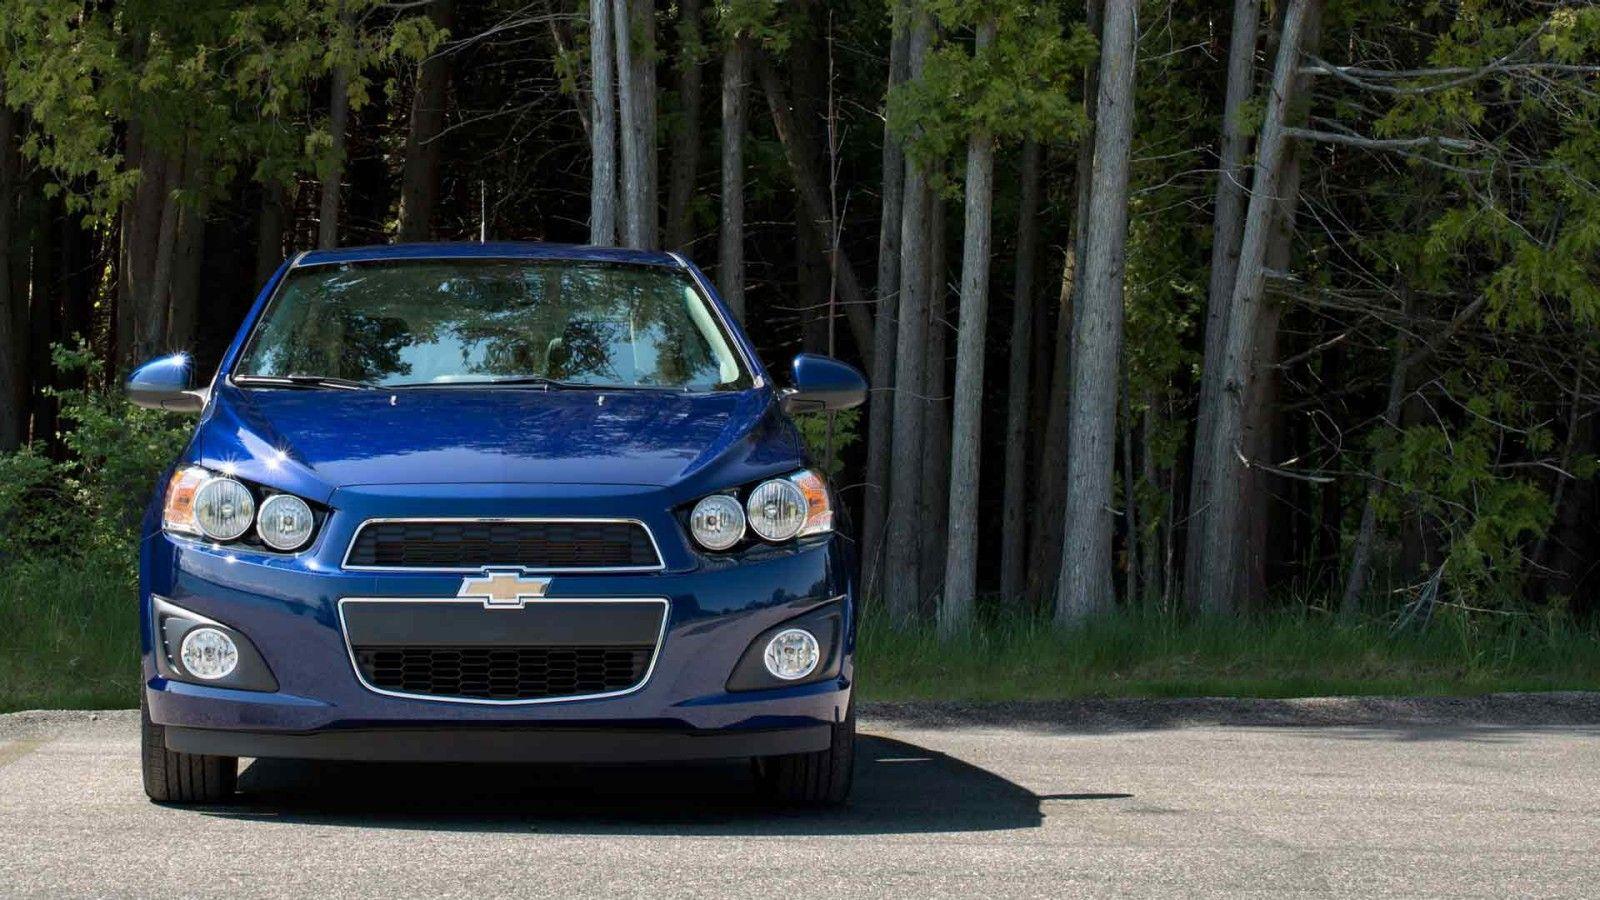 Blue Topaz Metallic Chevy Sonic Chevrolet Sonic 2014 Chevy